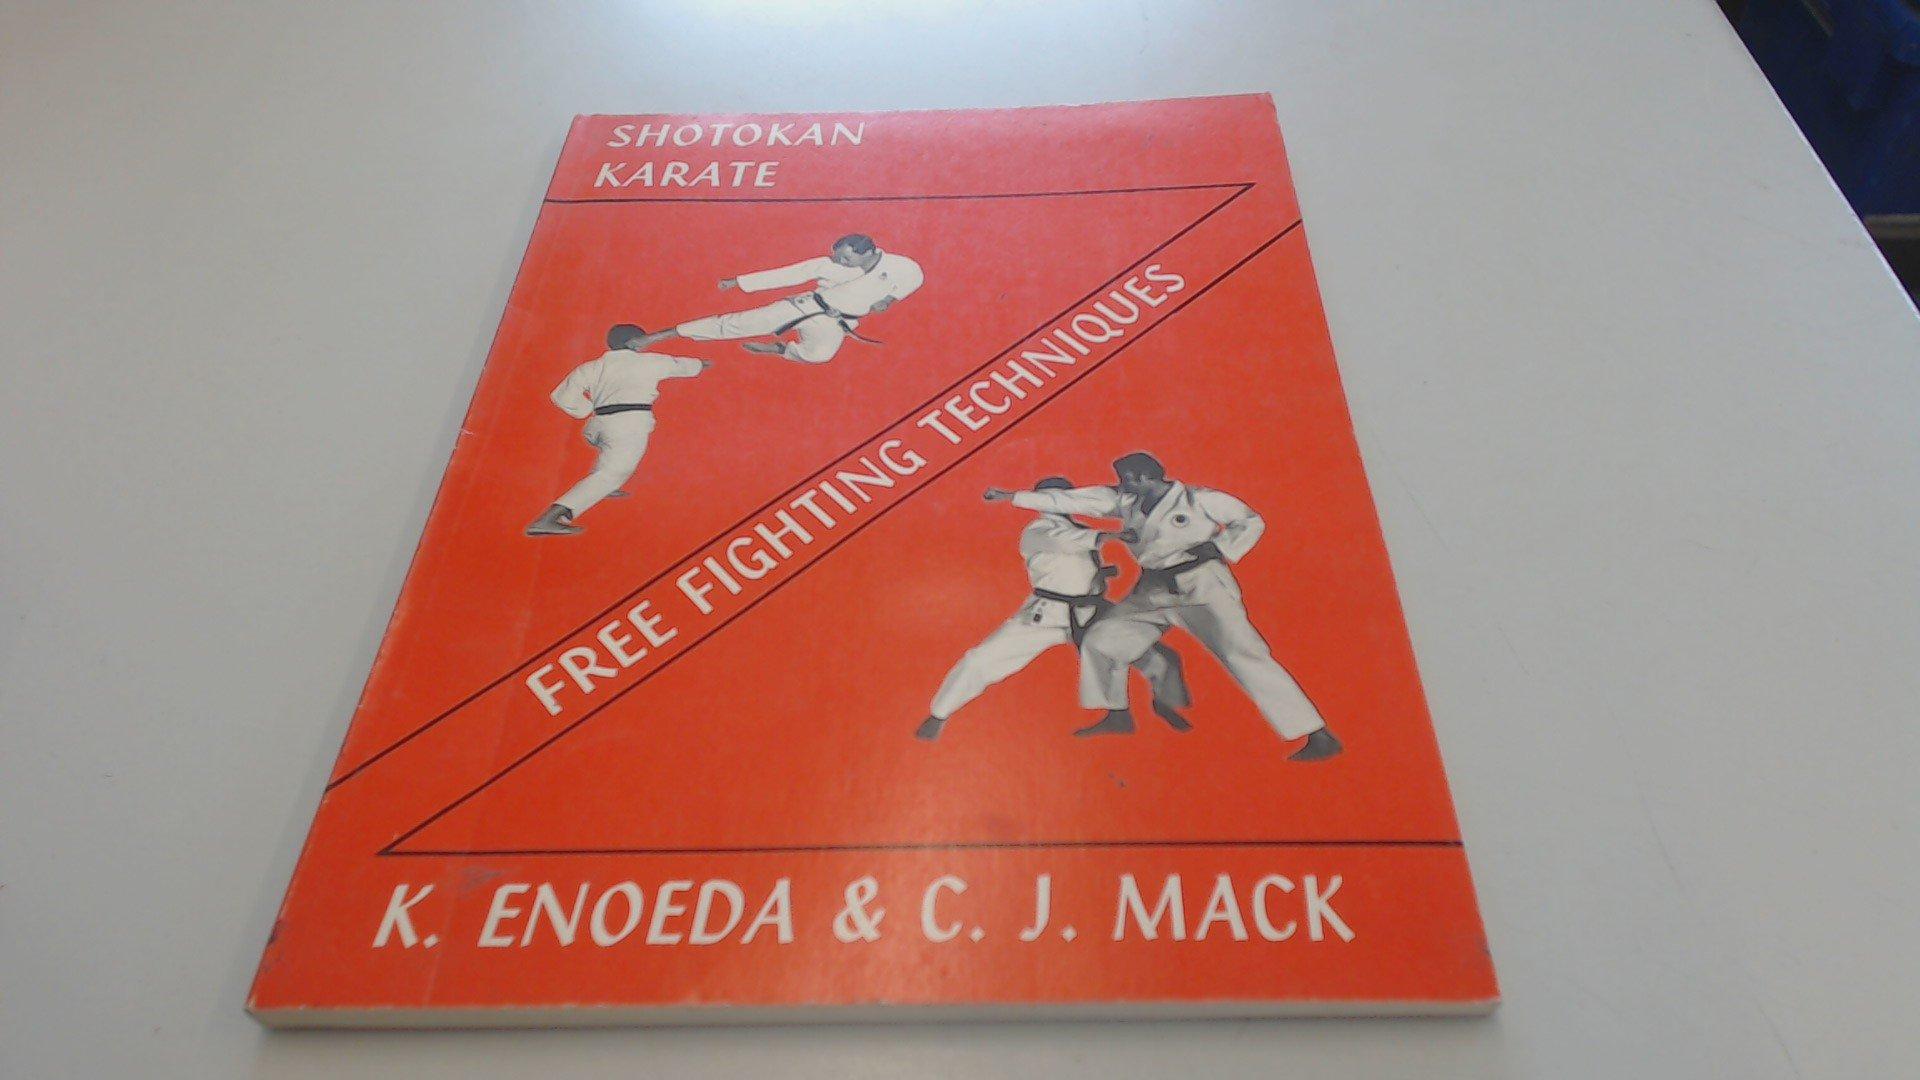 Shotokan Karate Free Fighting Techniques Amazones Cj